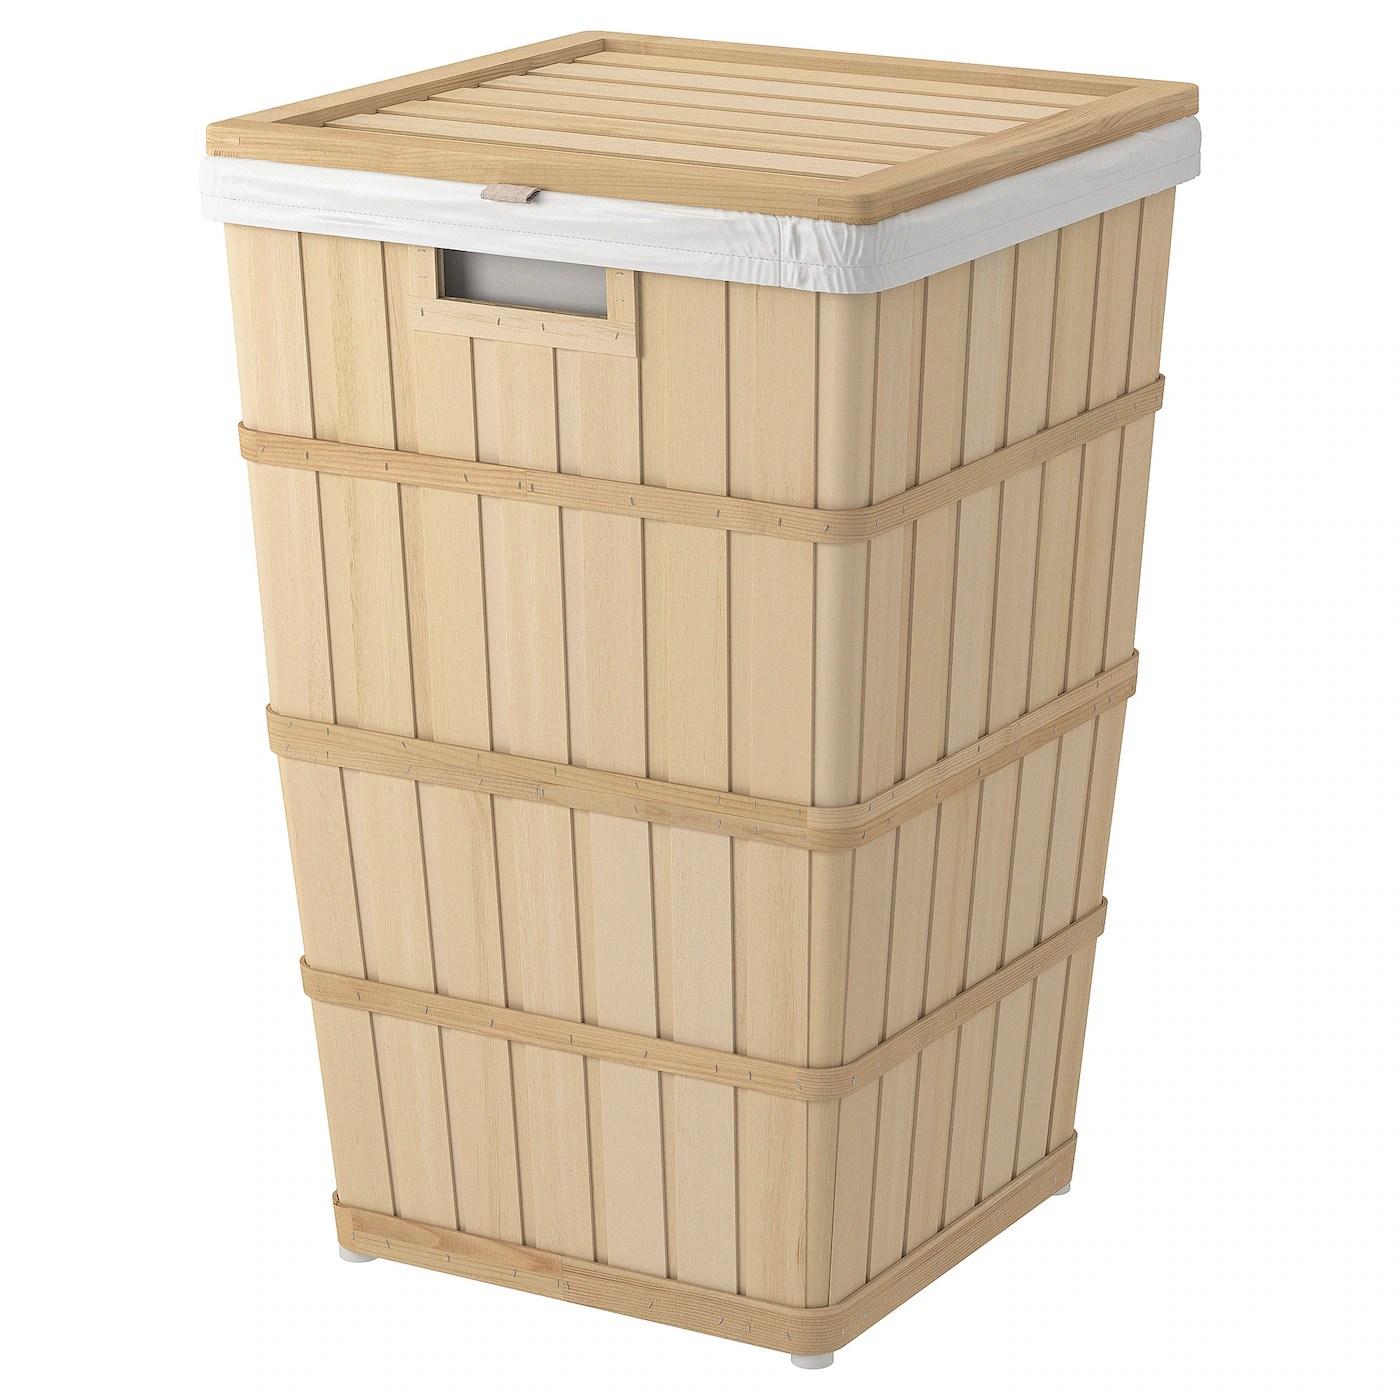 Brankis Panier A Linge Materiau Durable Ikea